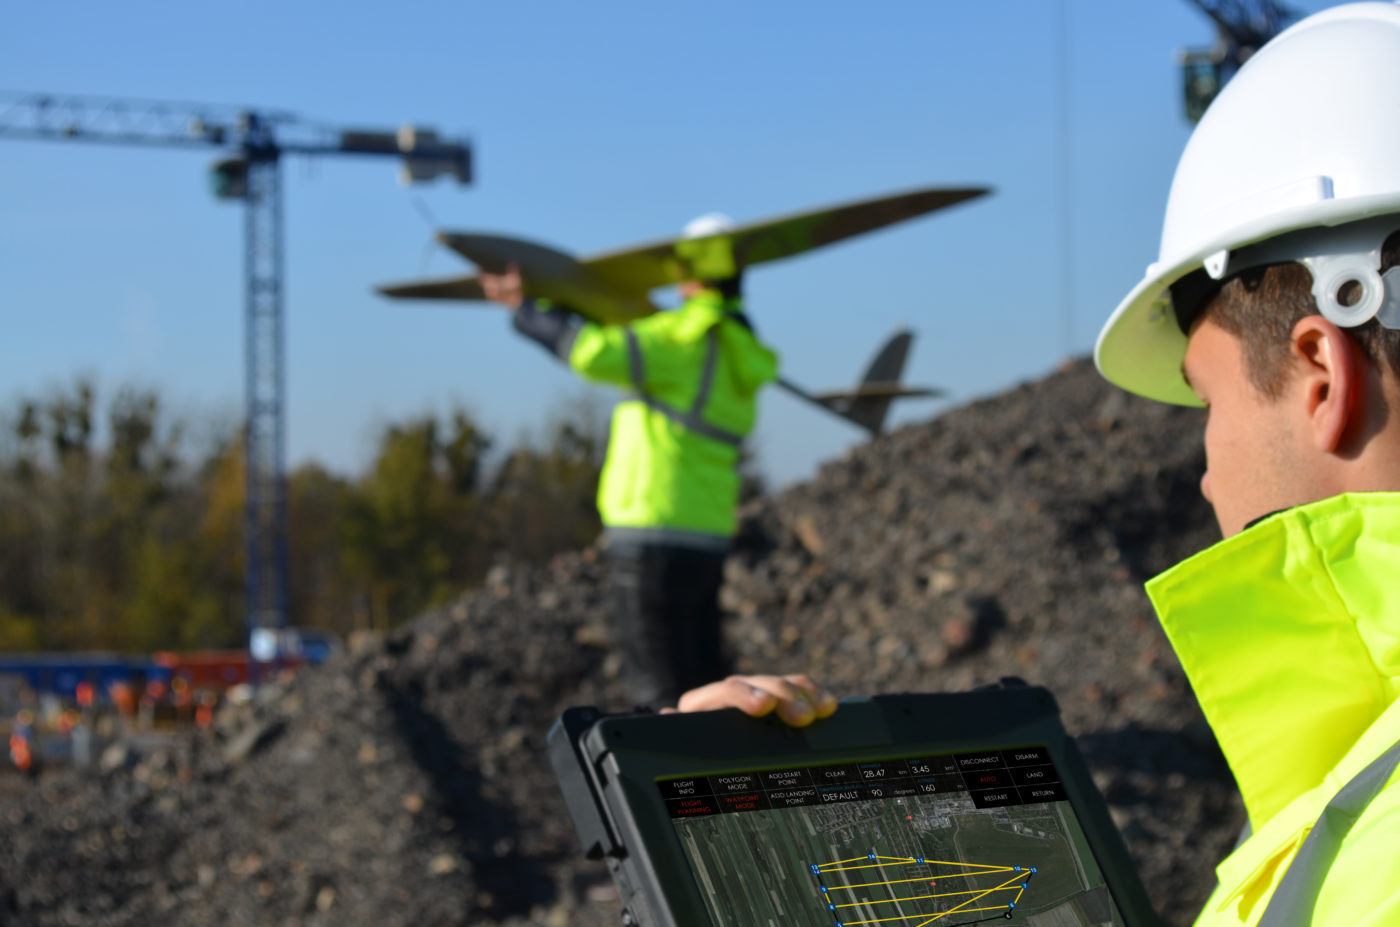 Usługi Prodron - profesjonalne usługi dronami